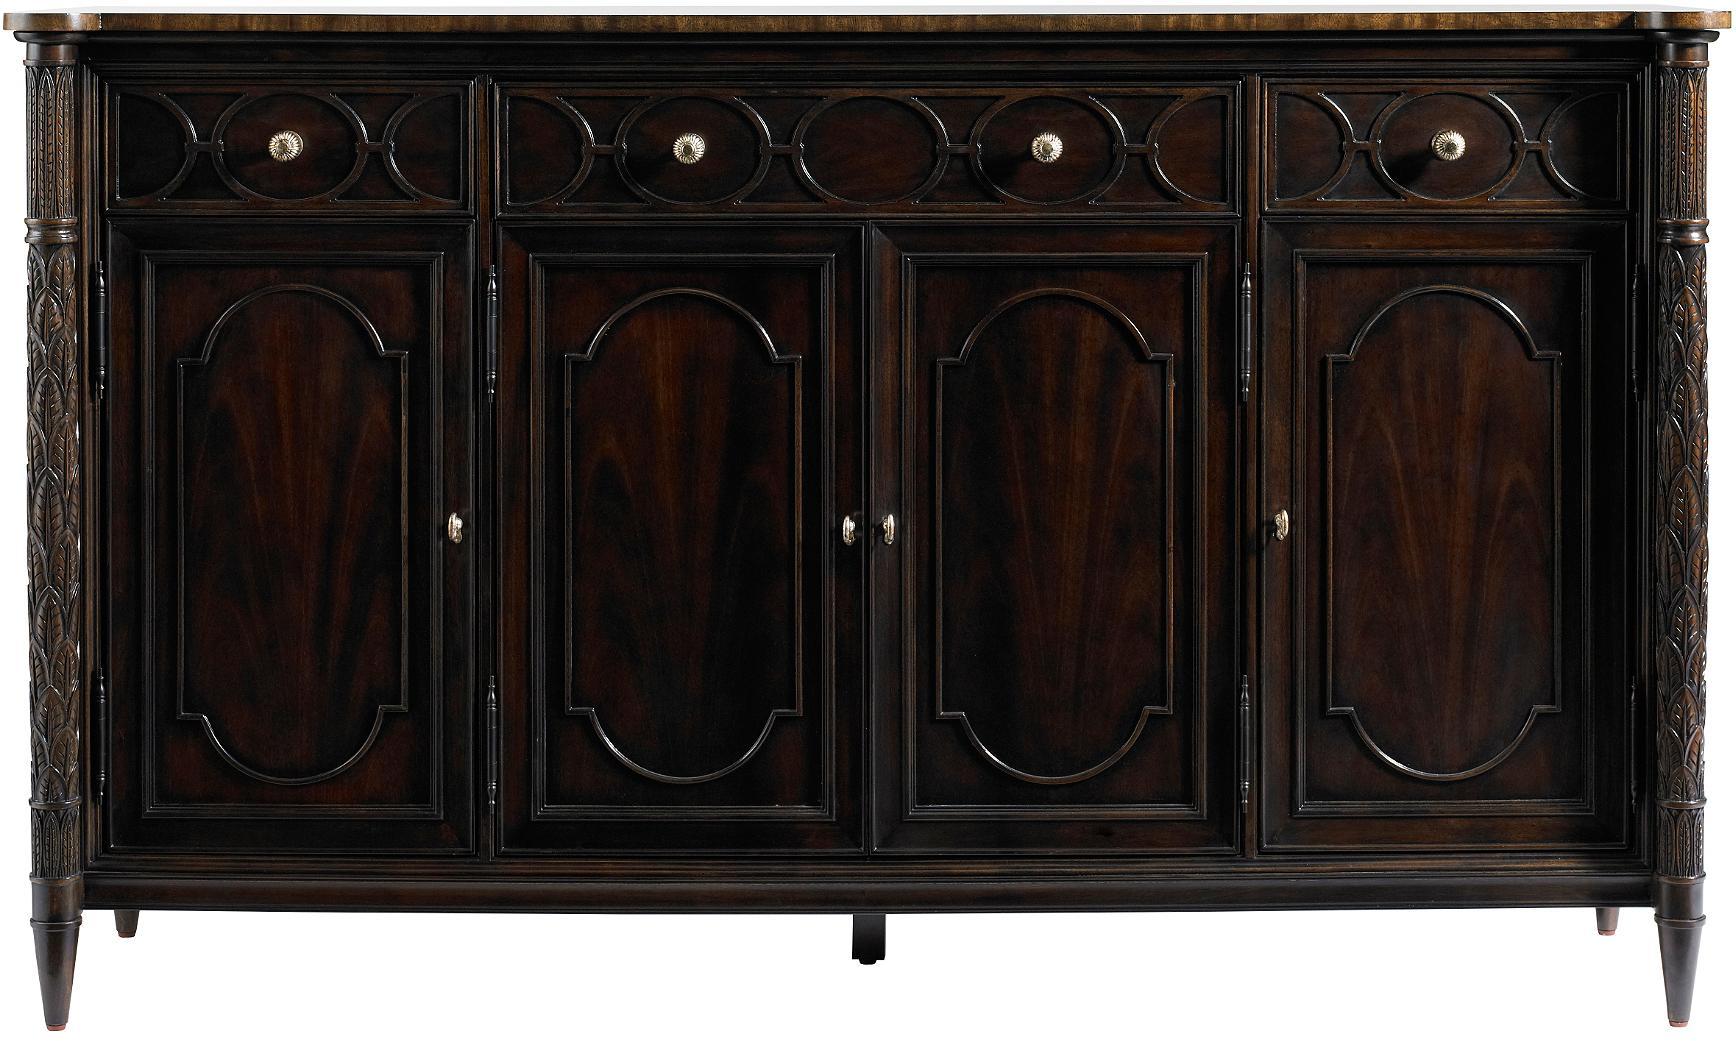 Stanley Furniture Charleston Regency East Battery Buffet - Item Number: 302-11-05